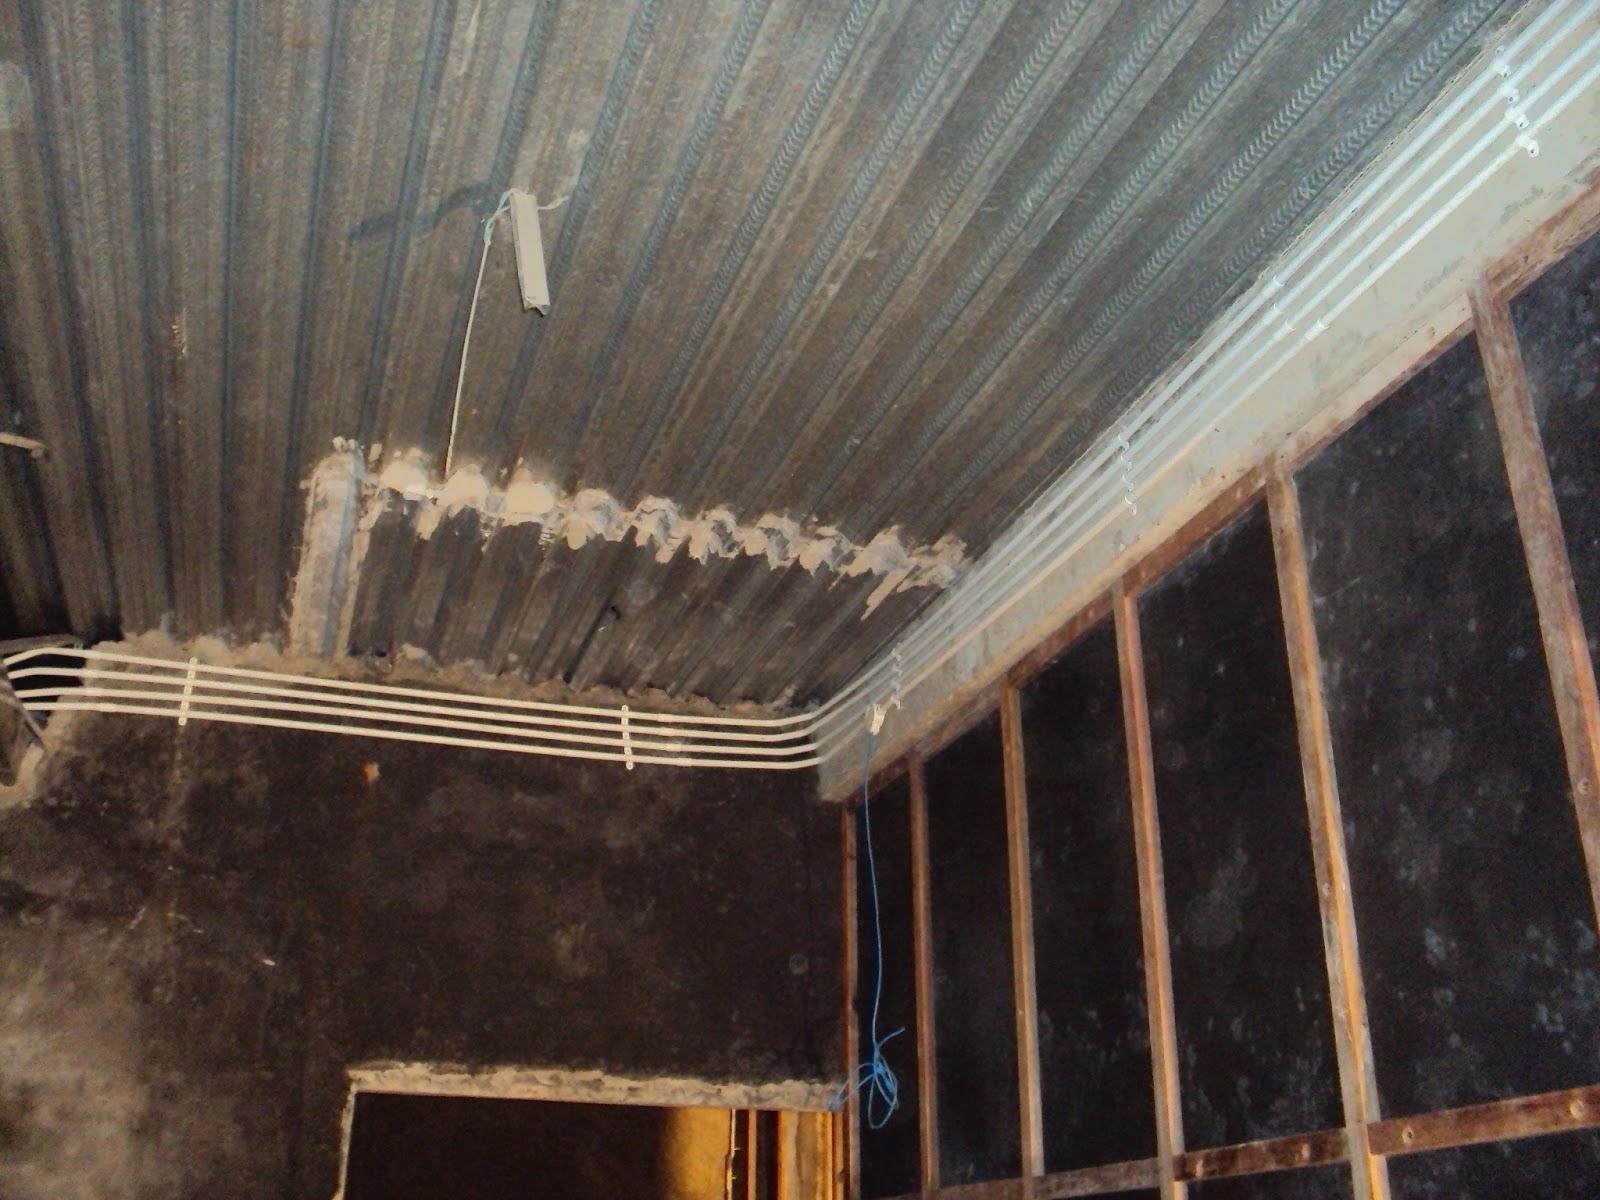 Kerusakan Instalasi Listrik Di Musim Penghujan Wiring Diagram Gedung Pada Waktu Hujan Kami Saran Kan Untuk Rumah Yang Berada Teraspekarangan Atau Taman Harus Pastikan Tidak Terkena Tetesan Air